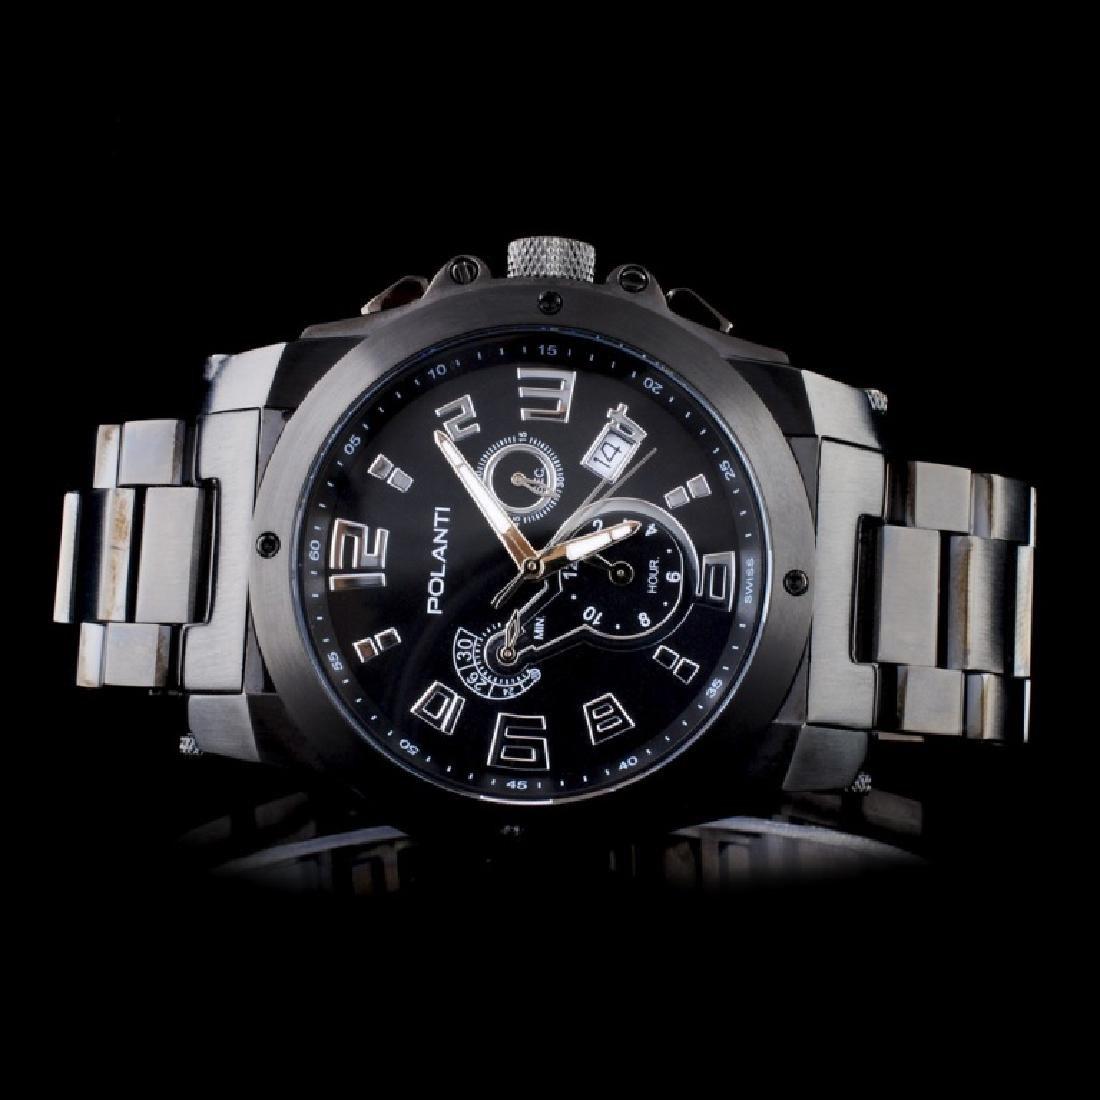 Polanti SS Zone Men's Wristwatch